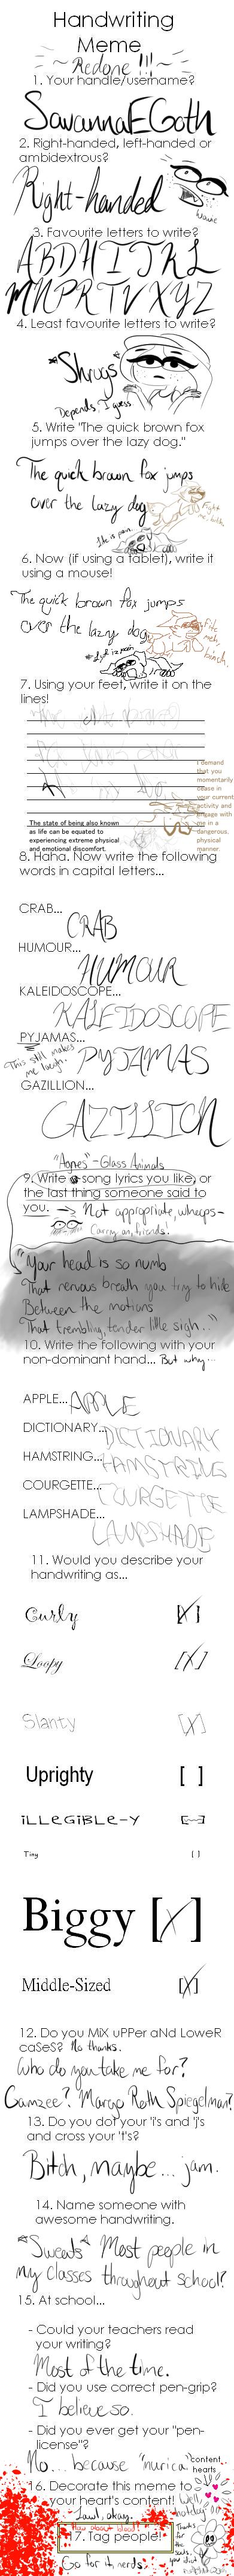 Handwriting Meme - REDONE! by SavannaEGoth